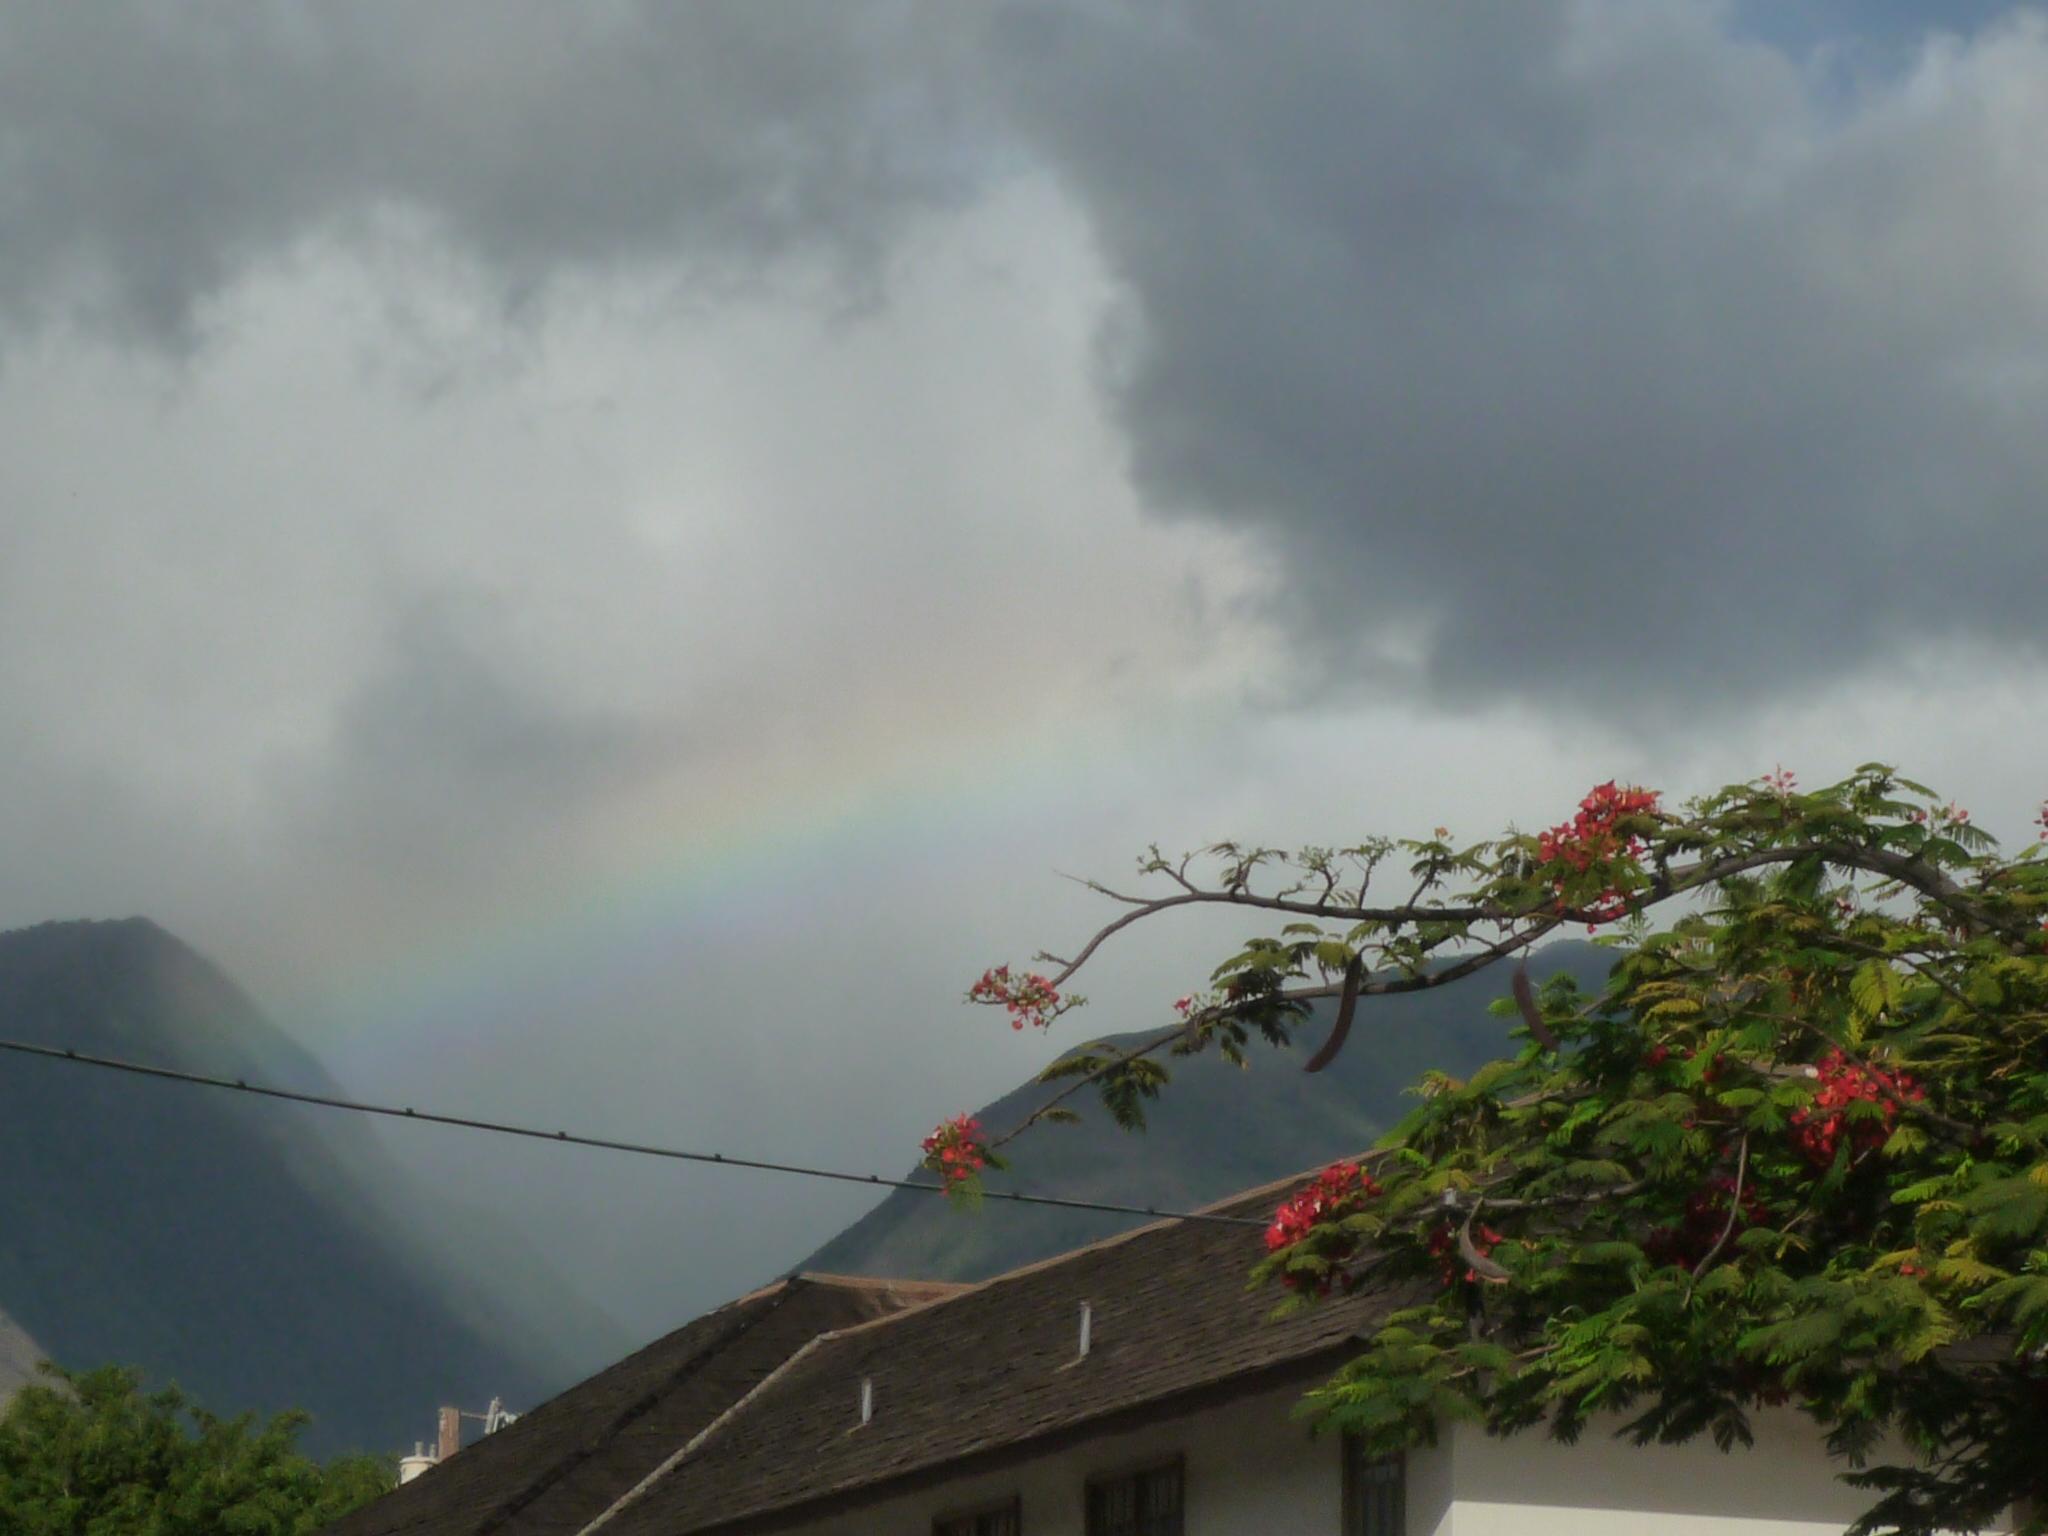 A rainbow over the mountains, from Lahania, Maui